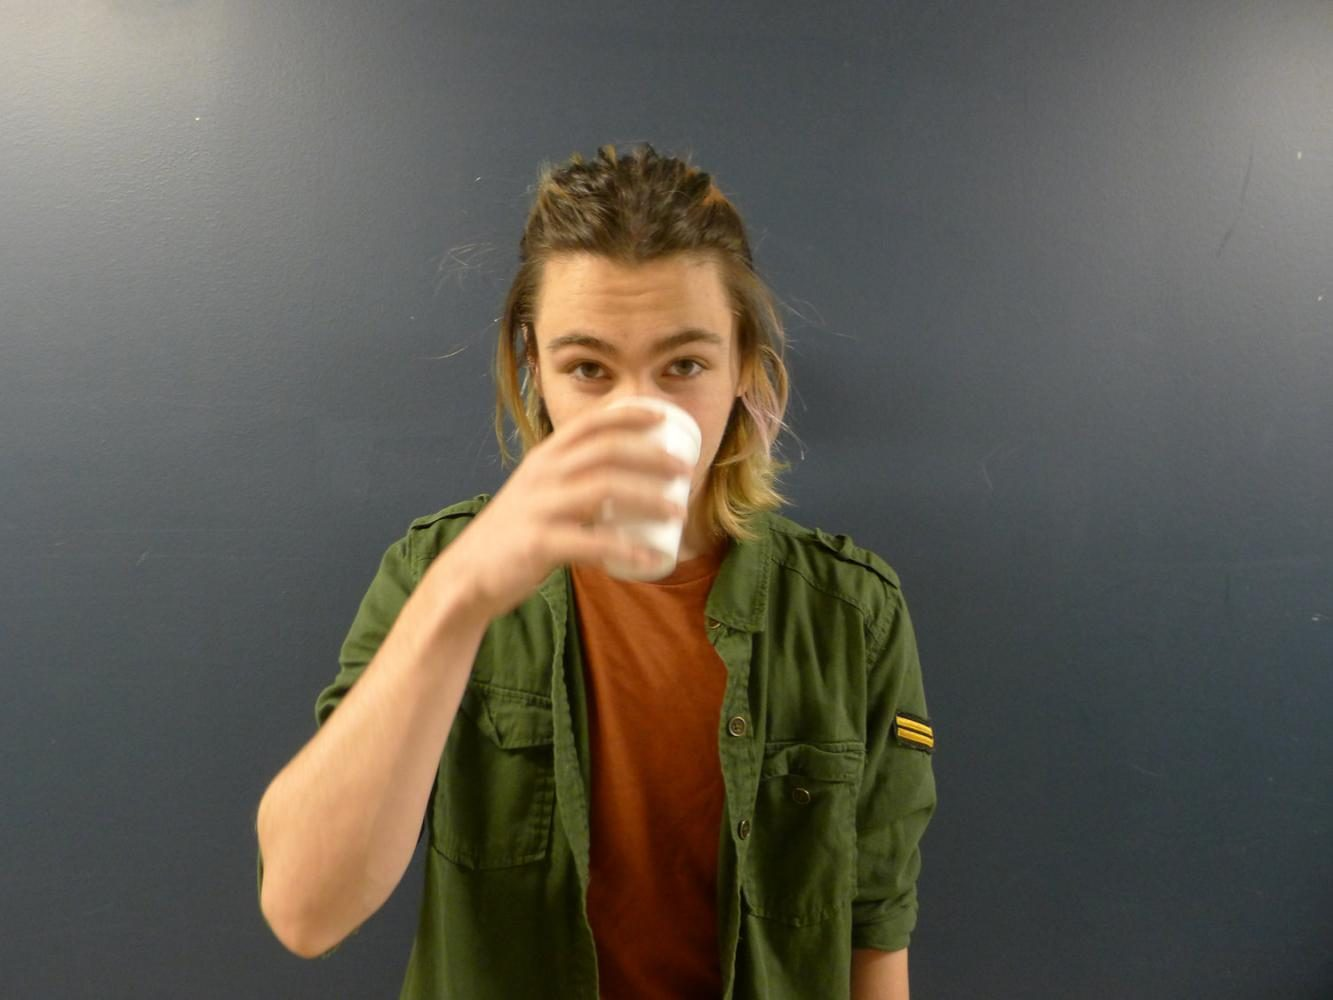 Ian Intagliata, junior